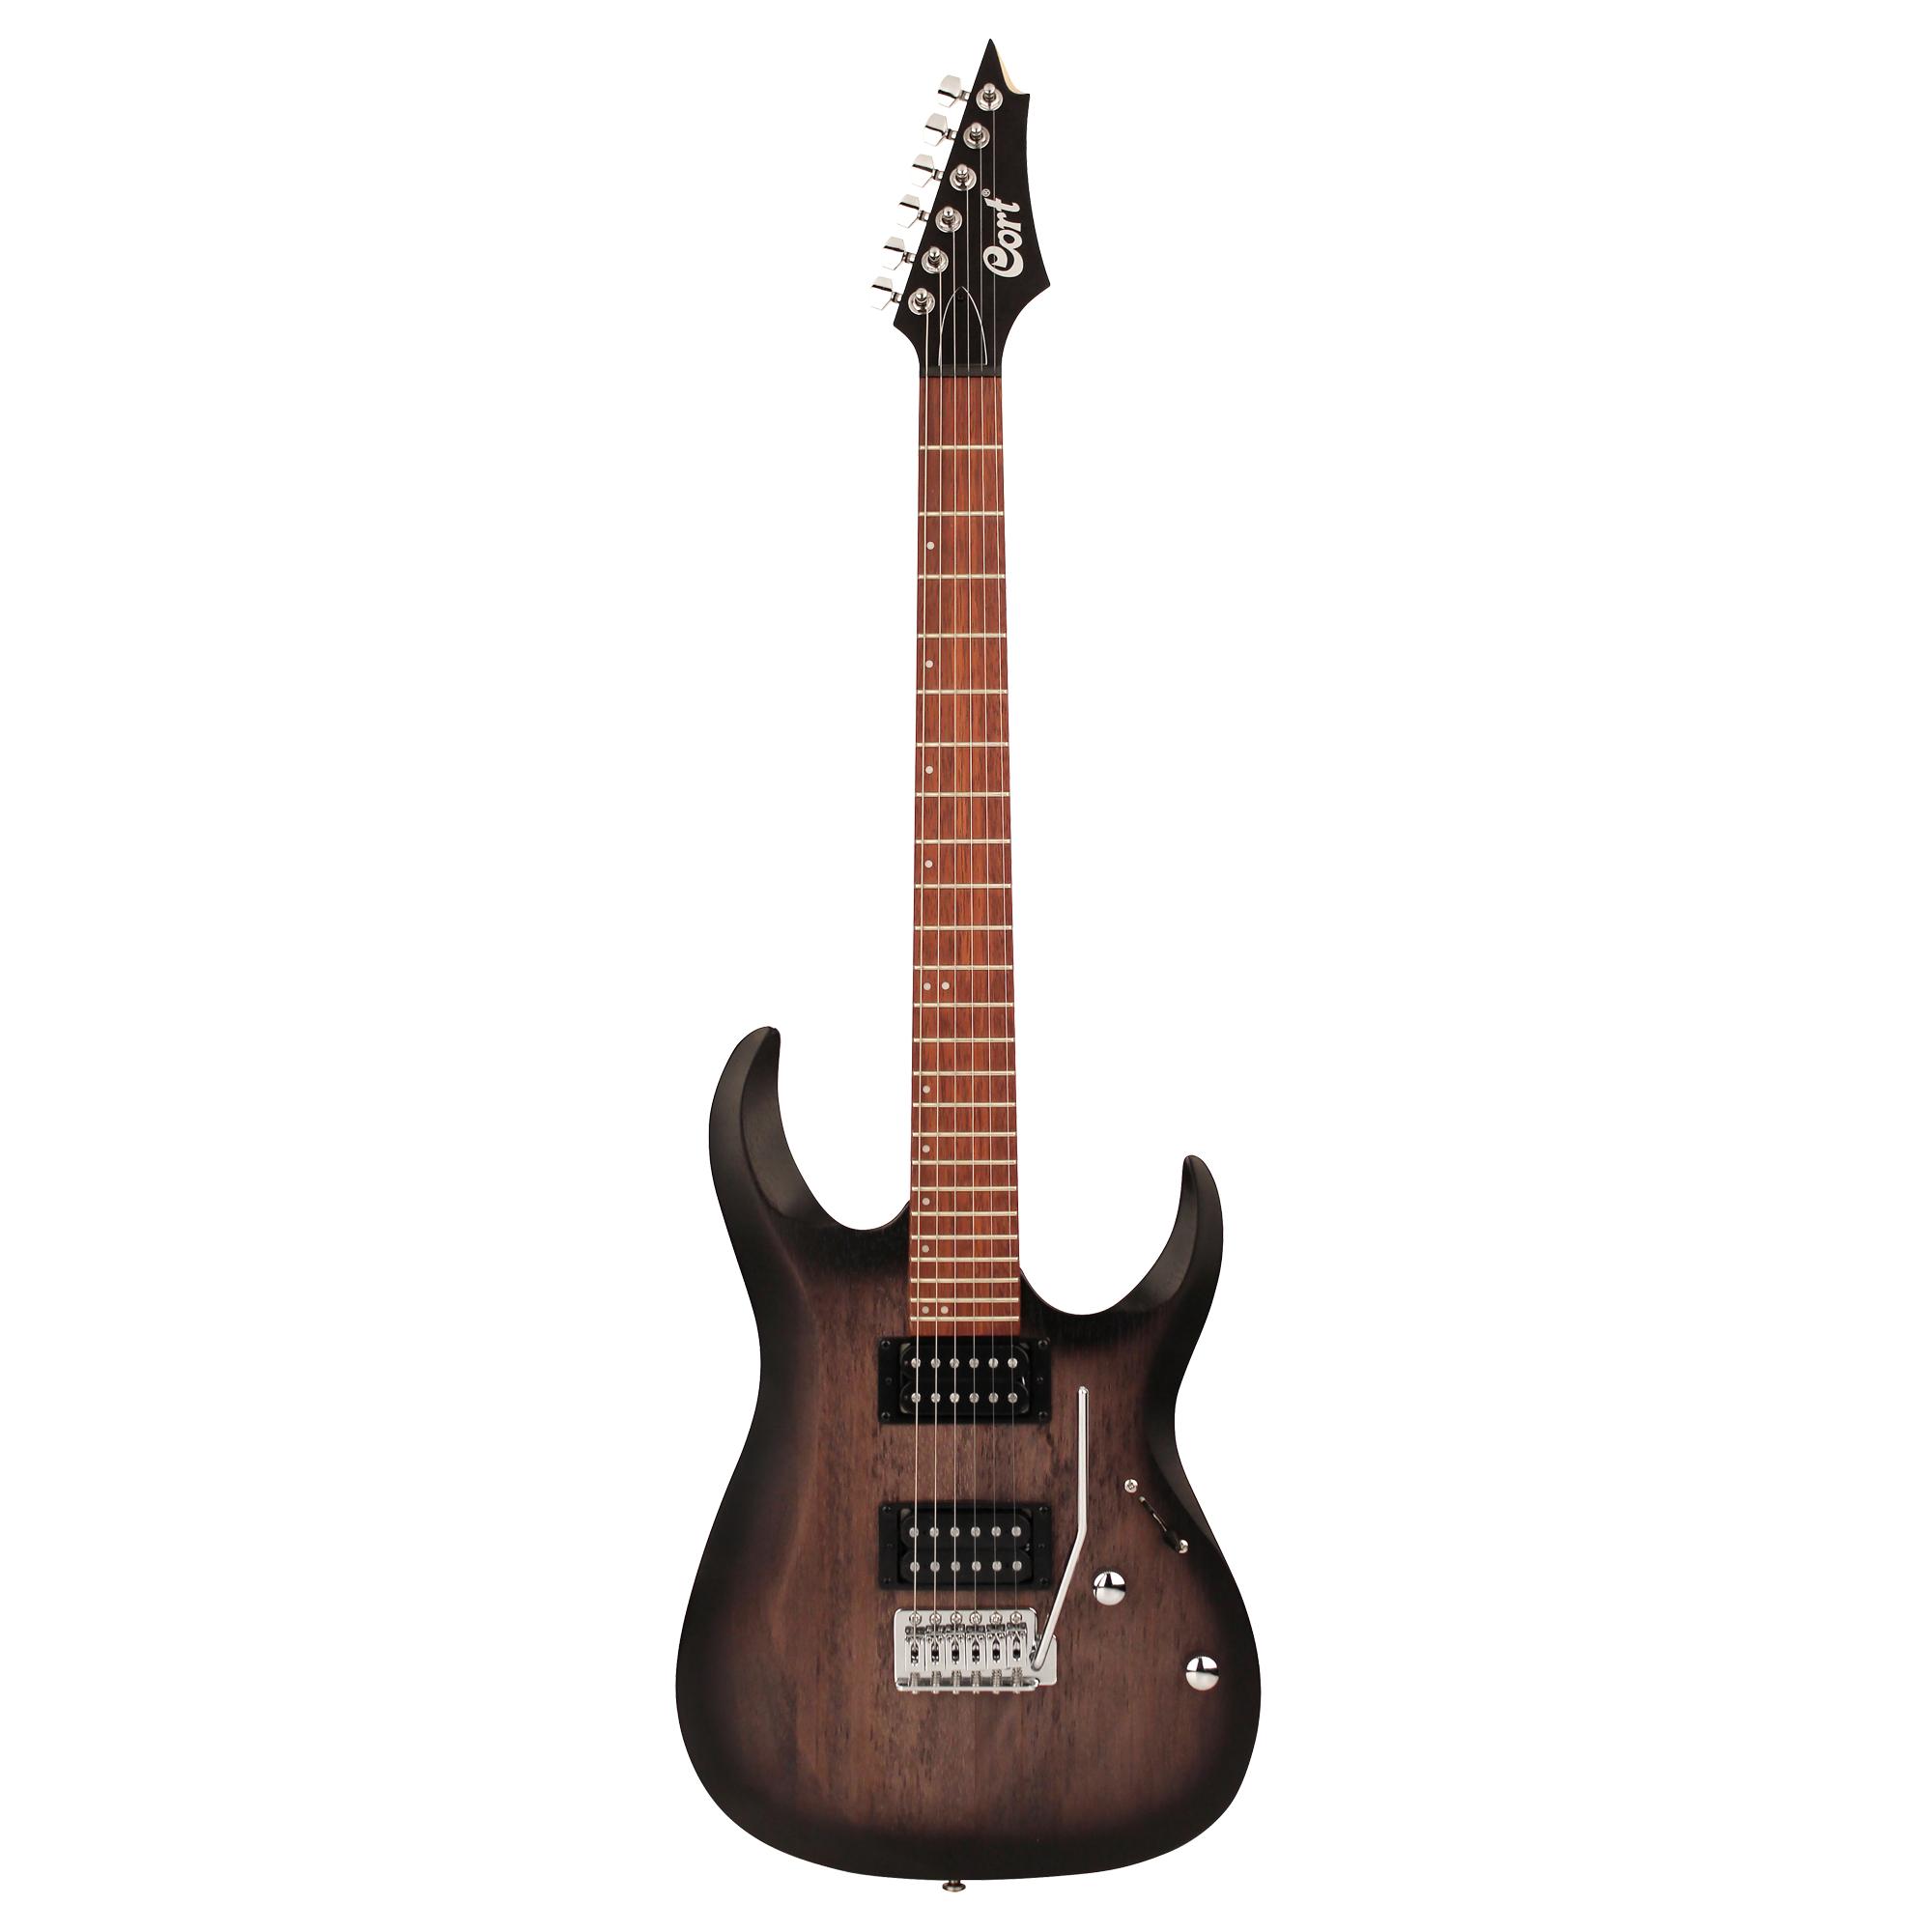 E-Gitarre X-100 Open Pore Black Burst